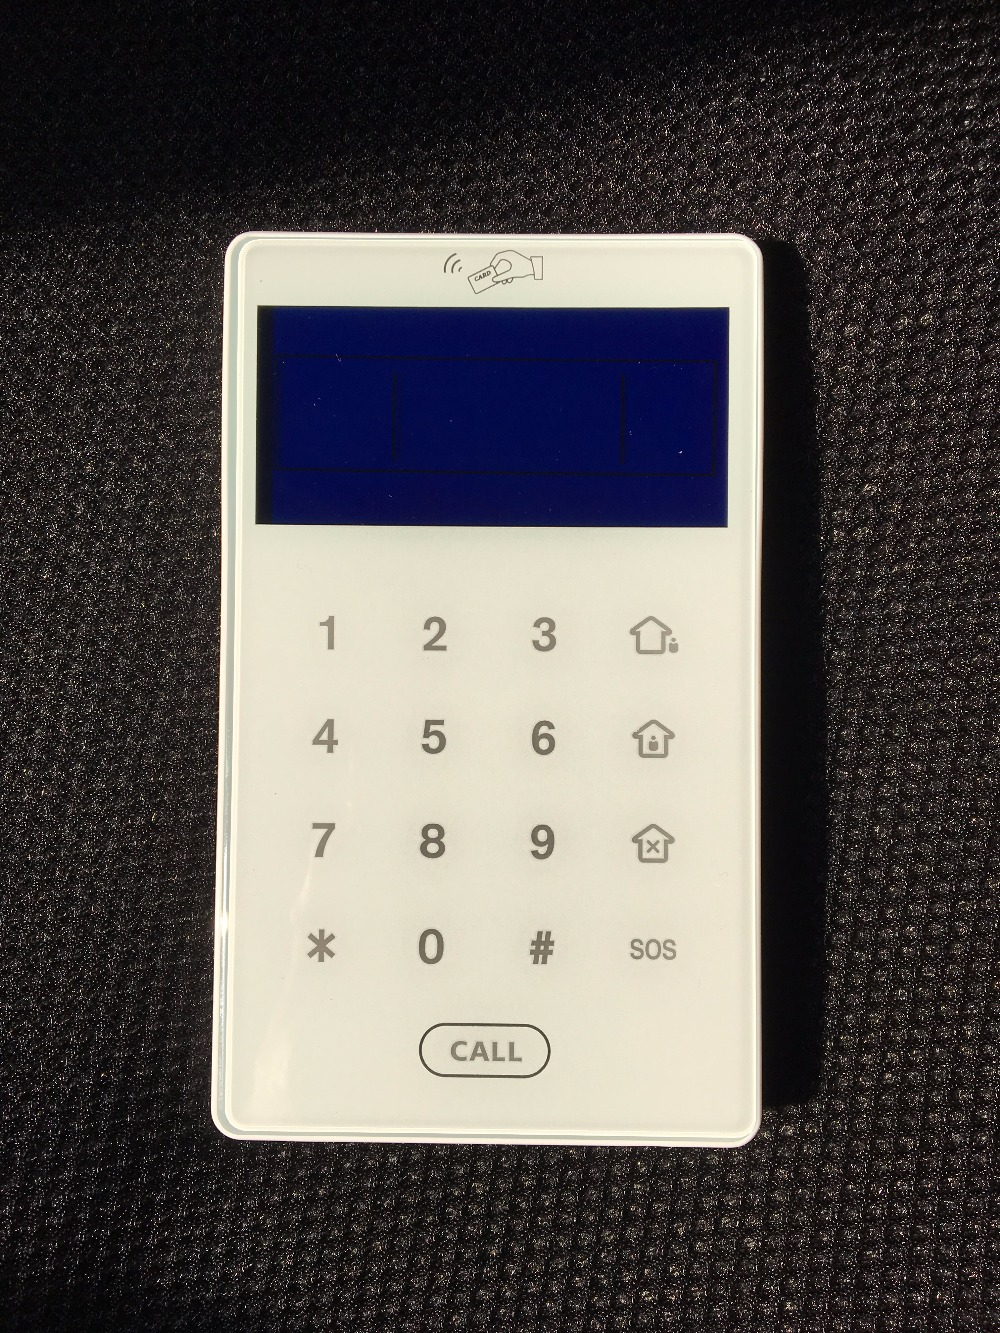 433mhz MeiAn PB-503R Wireless RFID Reader LCD Keypad RFID keypad for MeiAn series alarm host arm/disarm pb 502r nice design 868mhz two way keypad with lcd backlight remote arm disarm 868mhz alarme maison